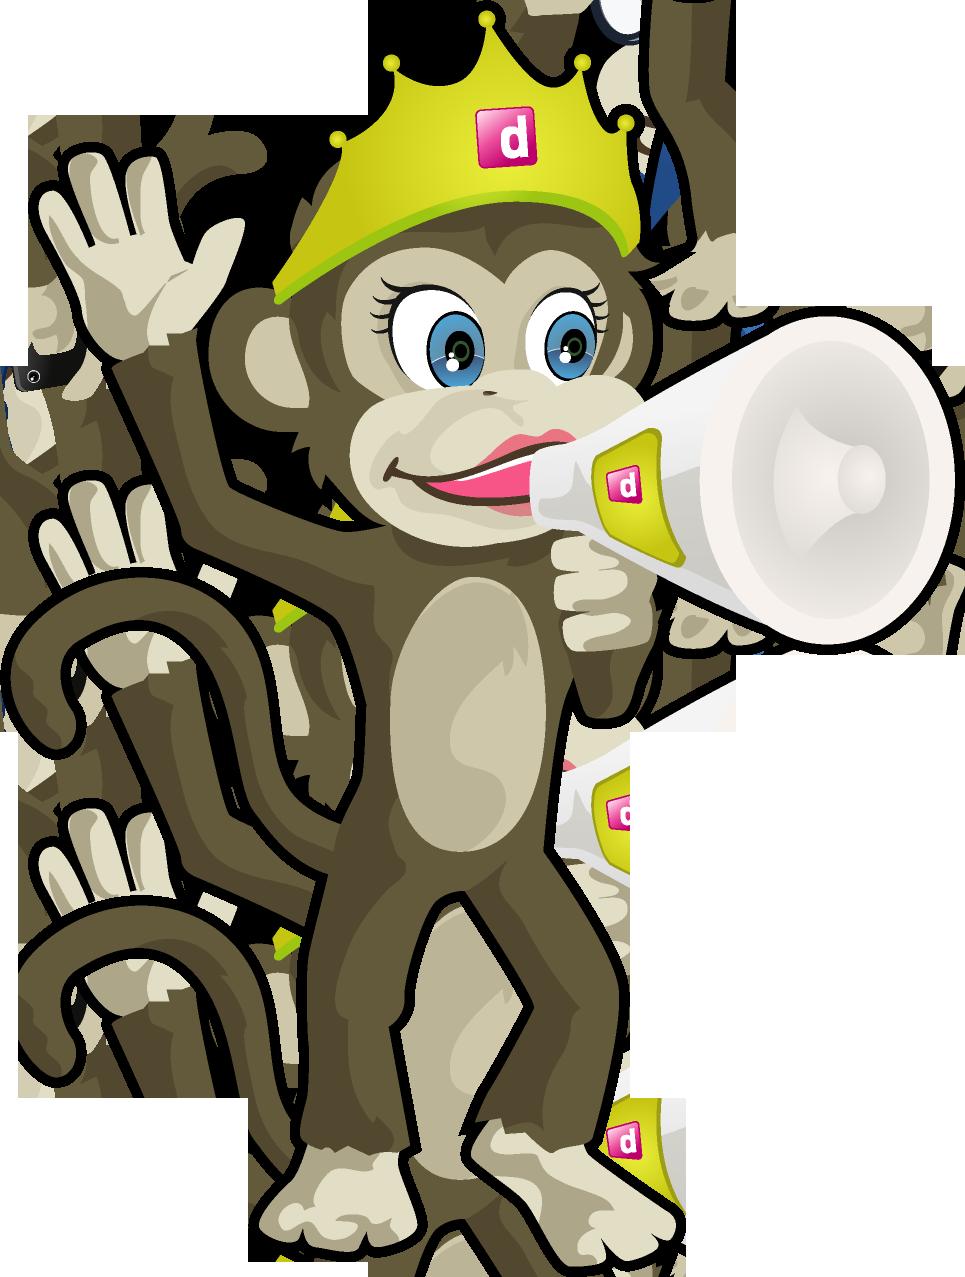 Chatter Monkey